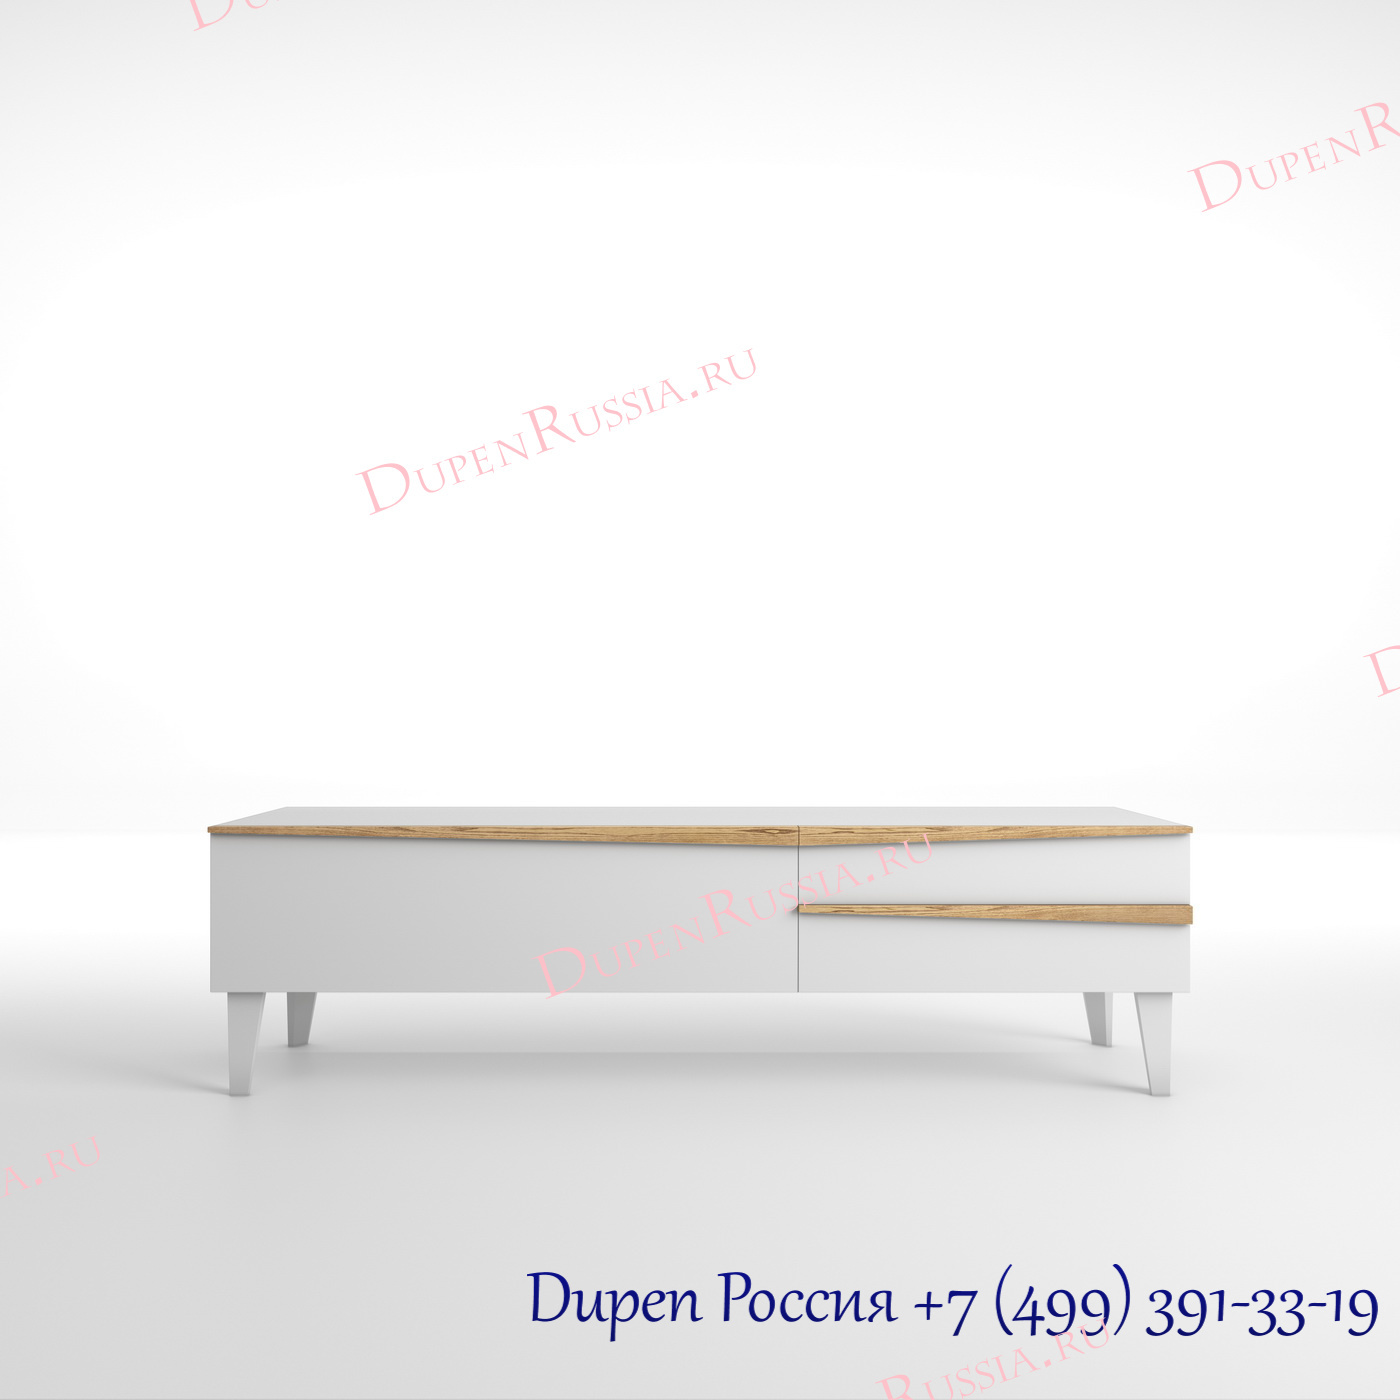 Тумба ТВ DUPEN ASPEN 165 CM с ящиками